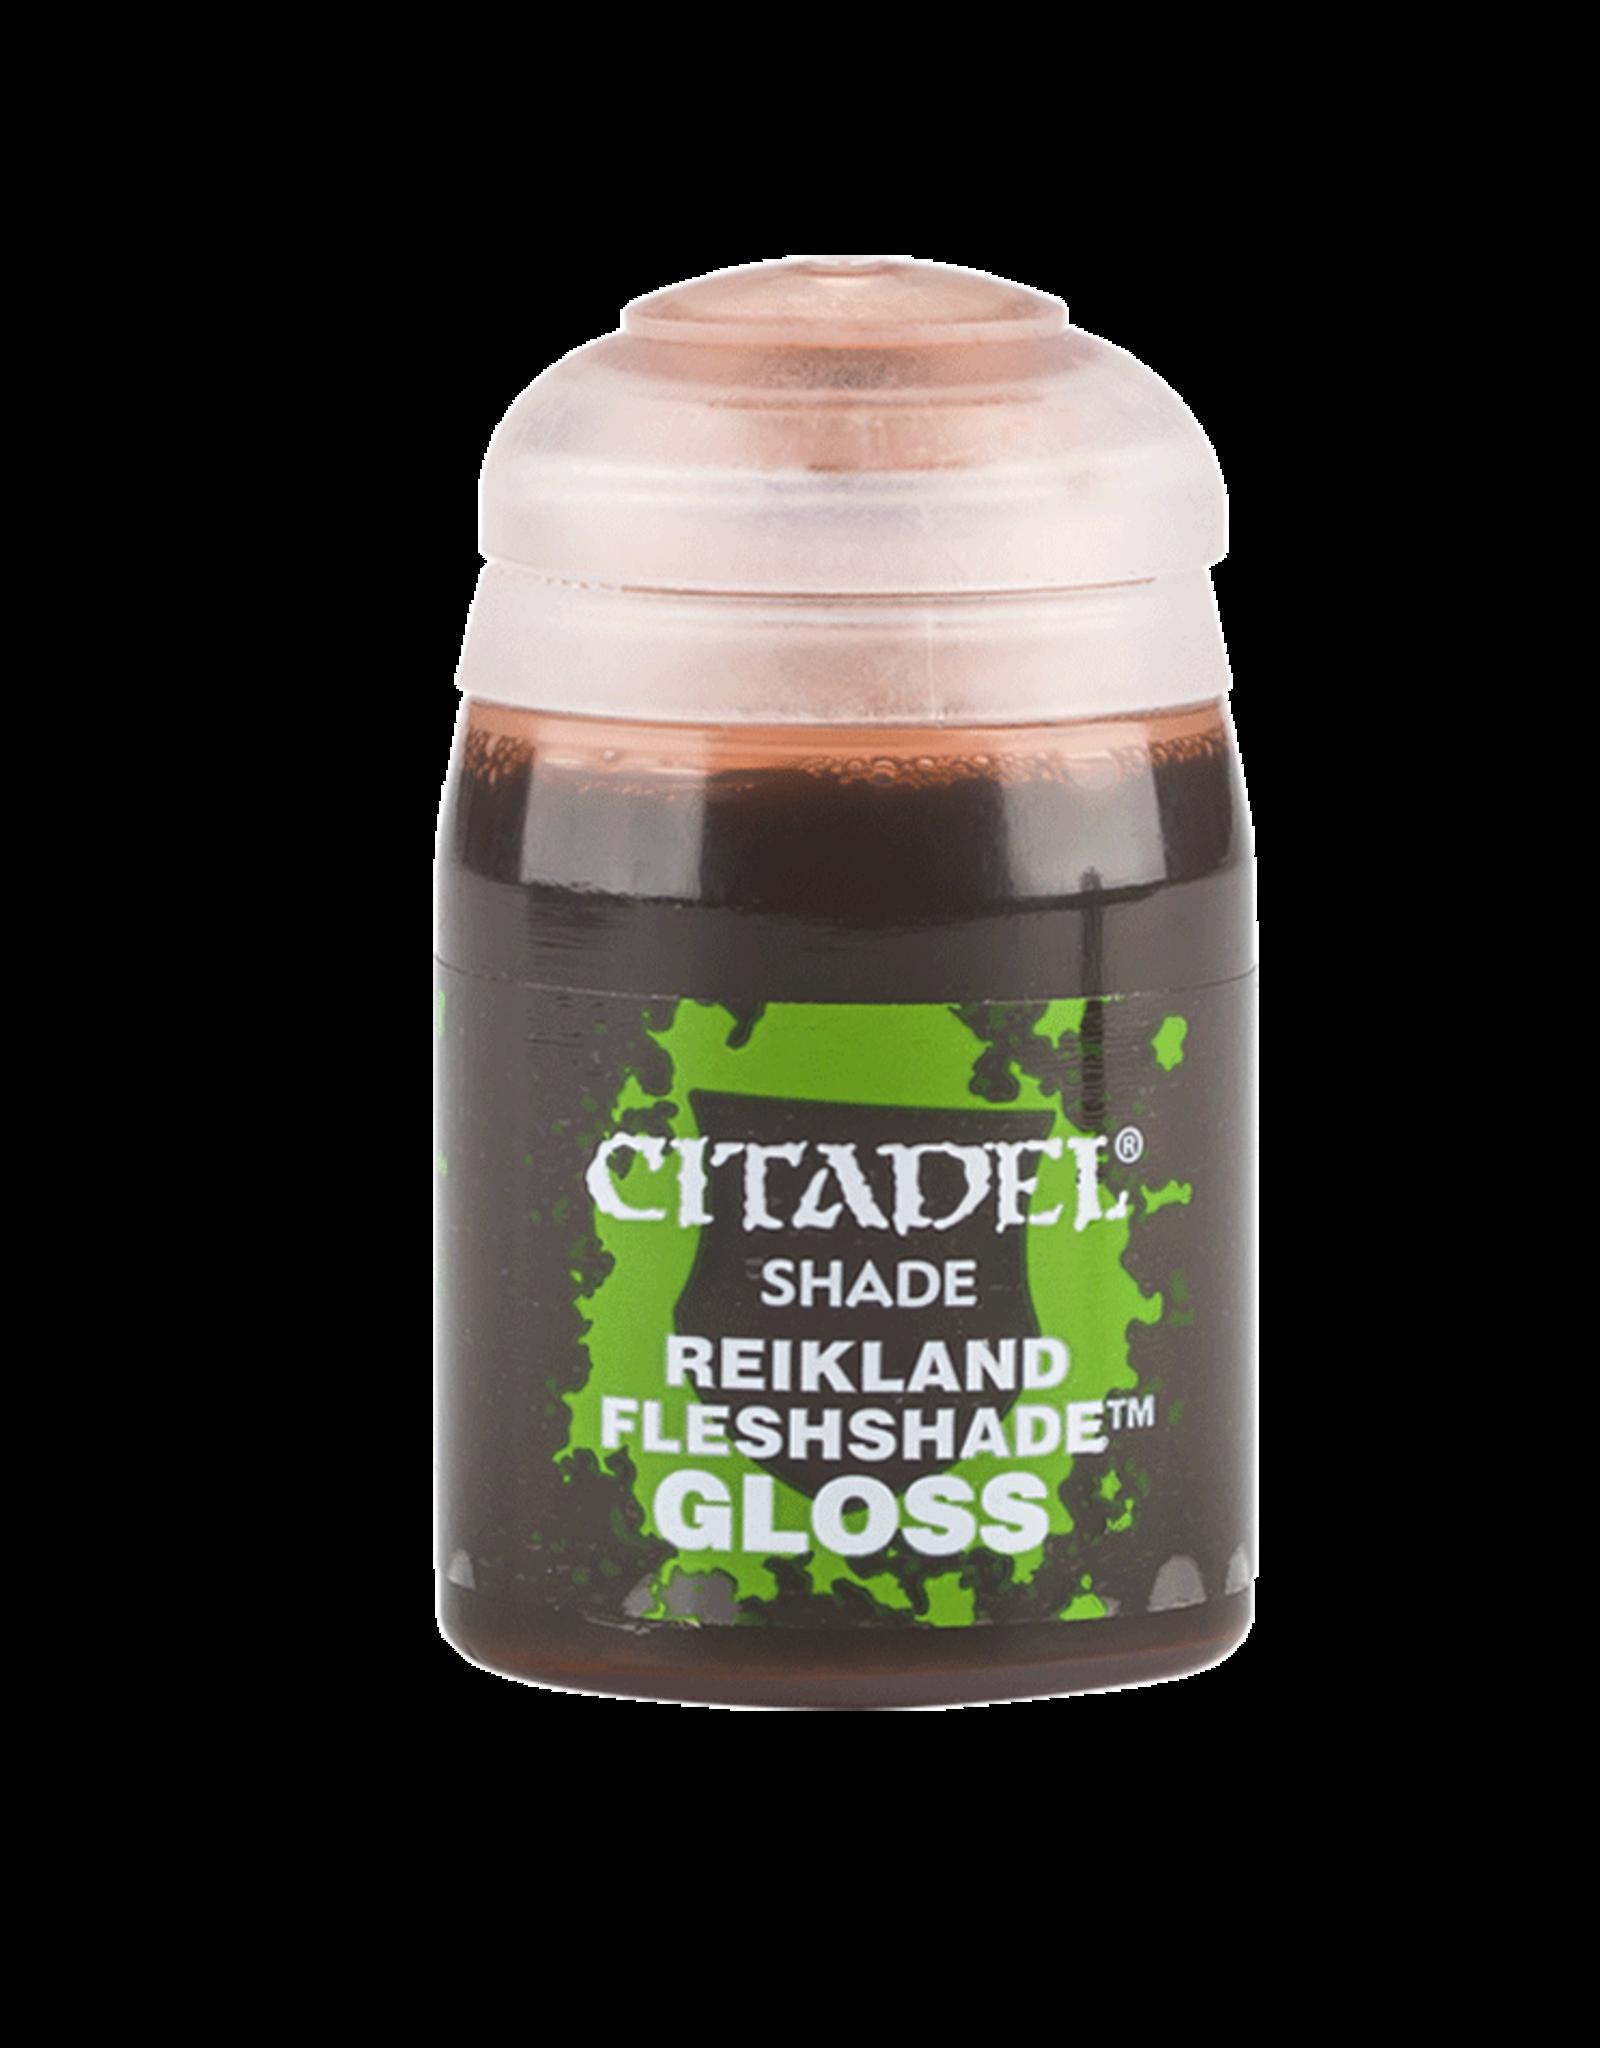 Citadel Citadel Shade: Reikland Fleshshade Gloss (24ml)